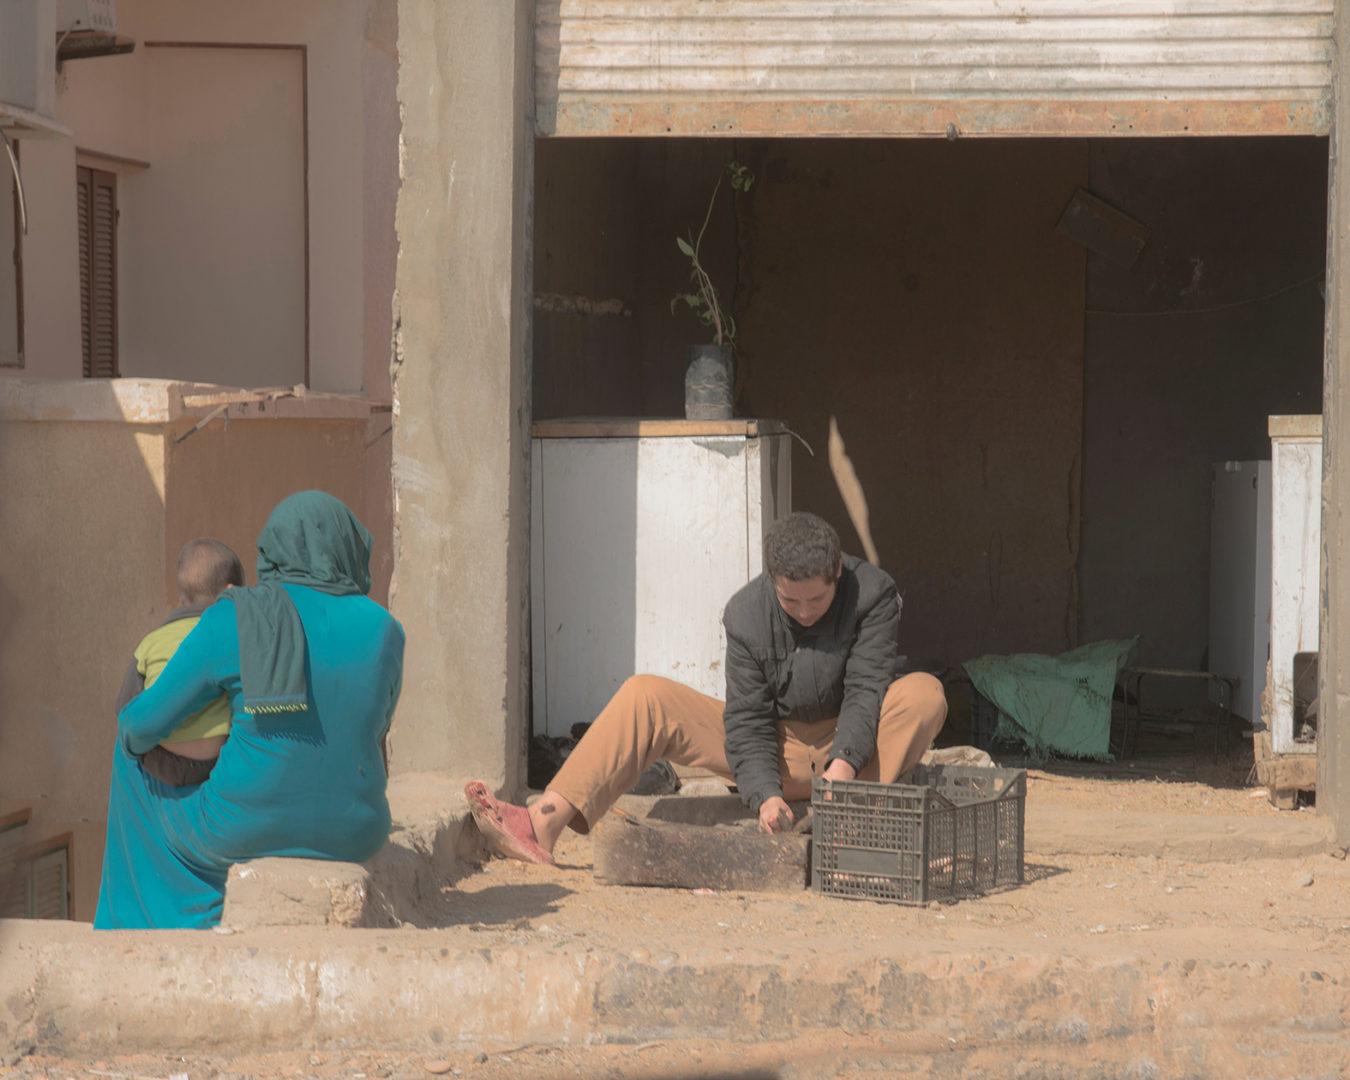 A family in Aswan